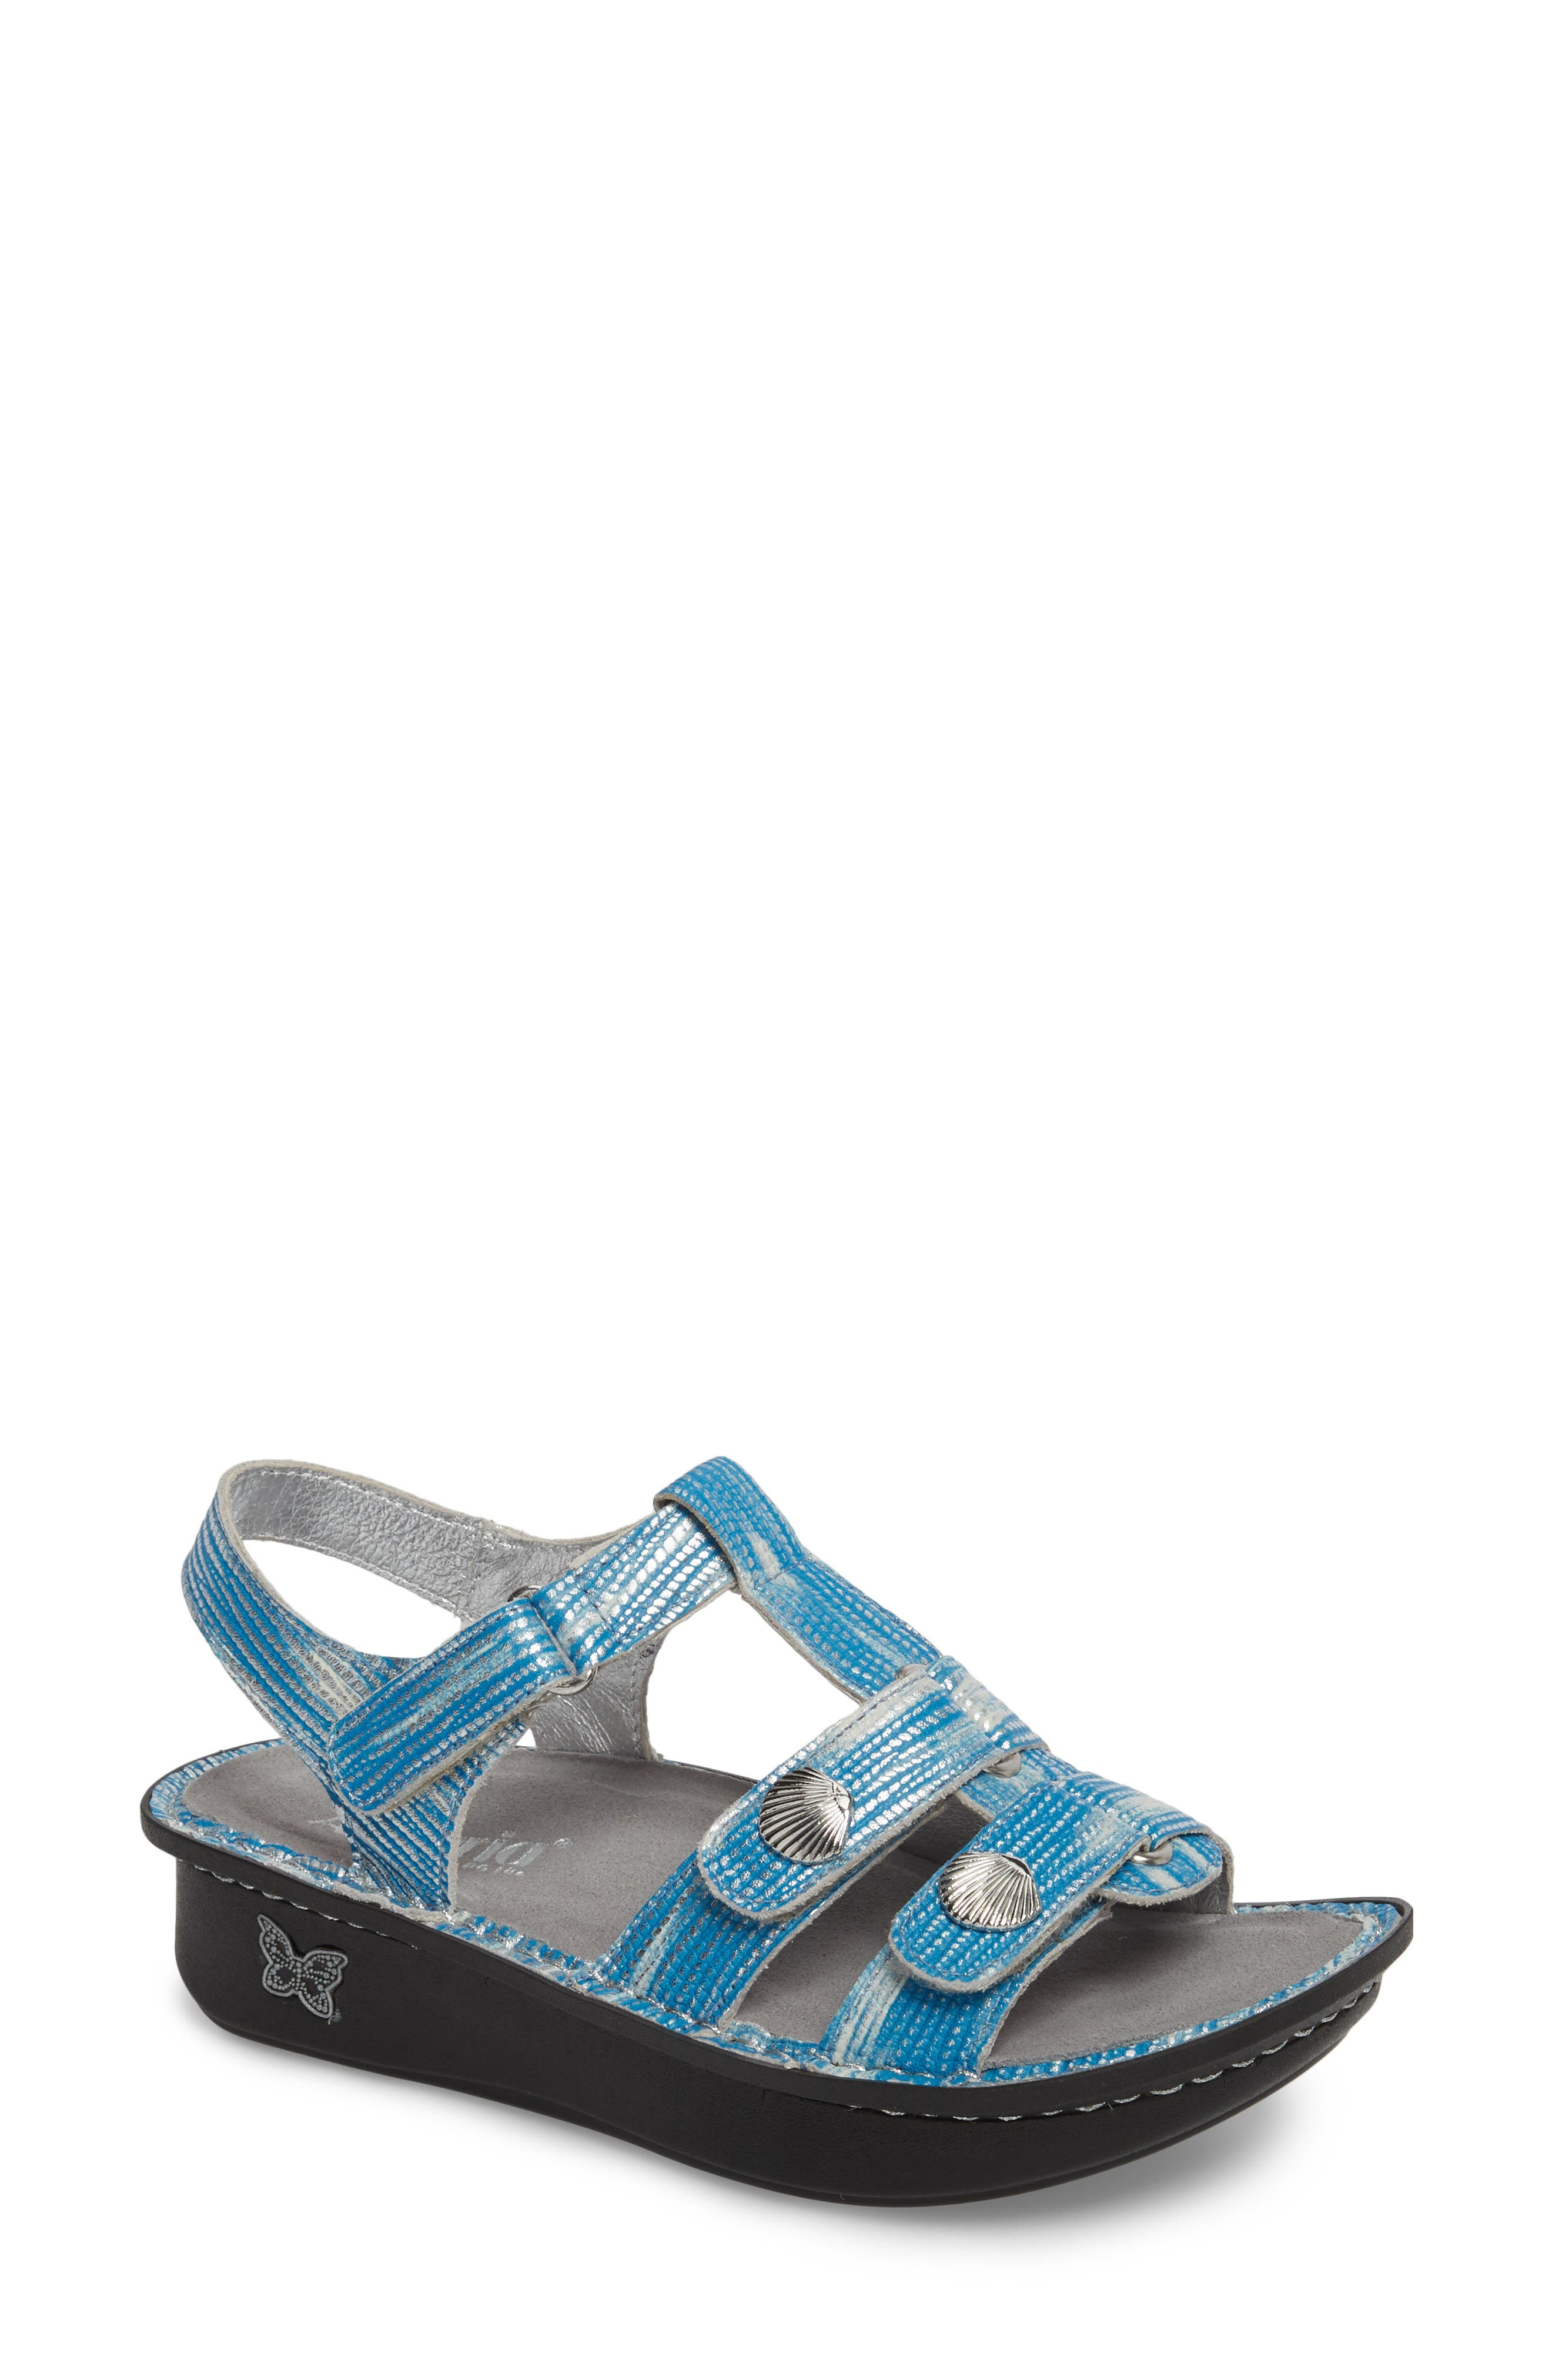 'Kleo' Sandal,                             Main thumbnail 1, color,                             Wrapture Blues Leather